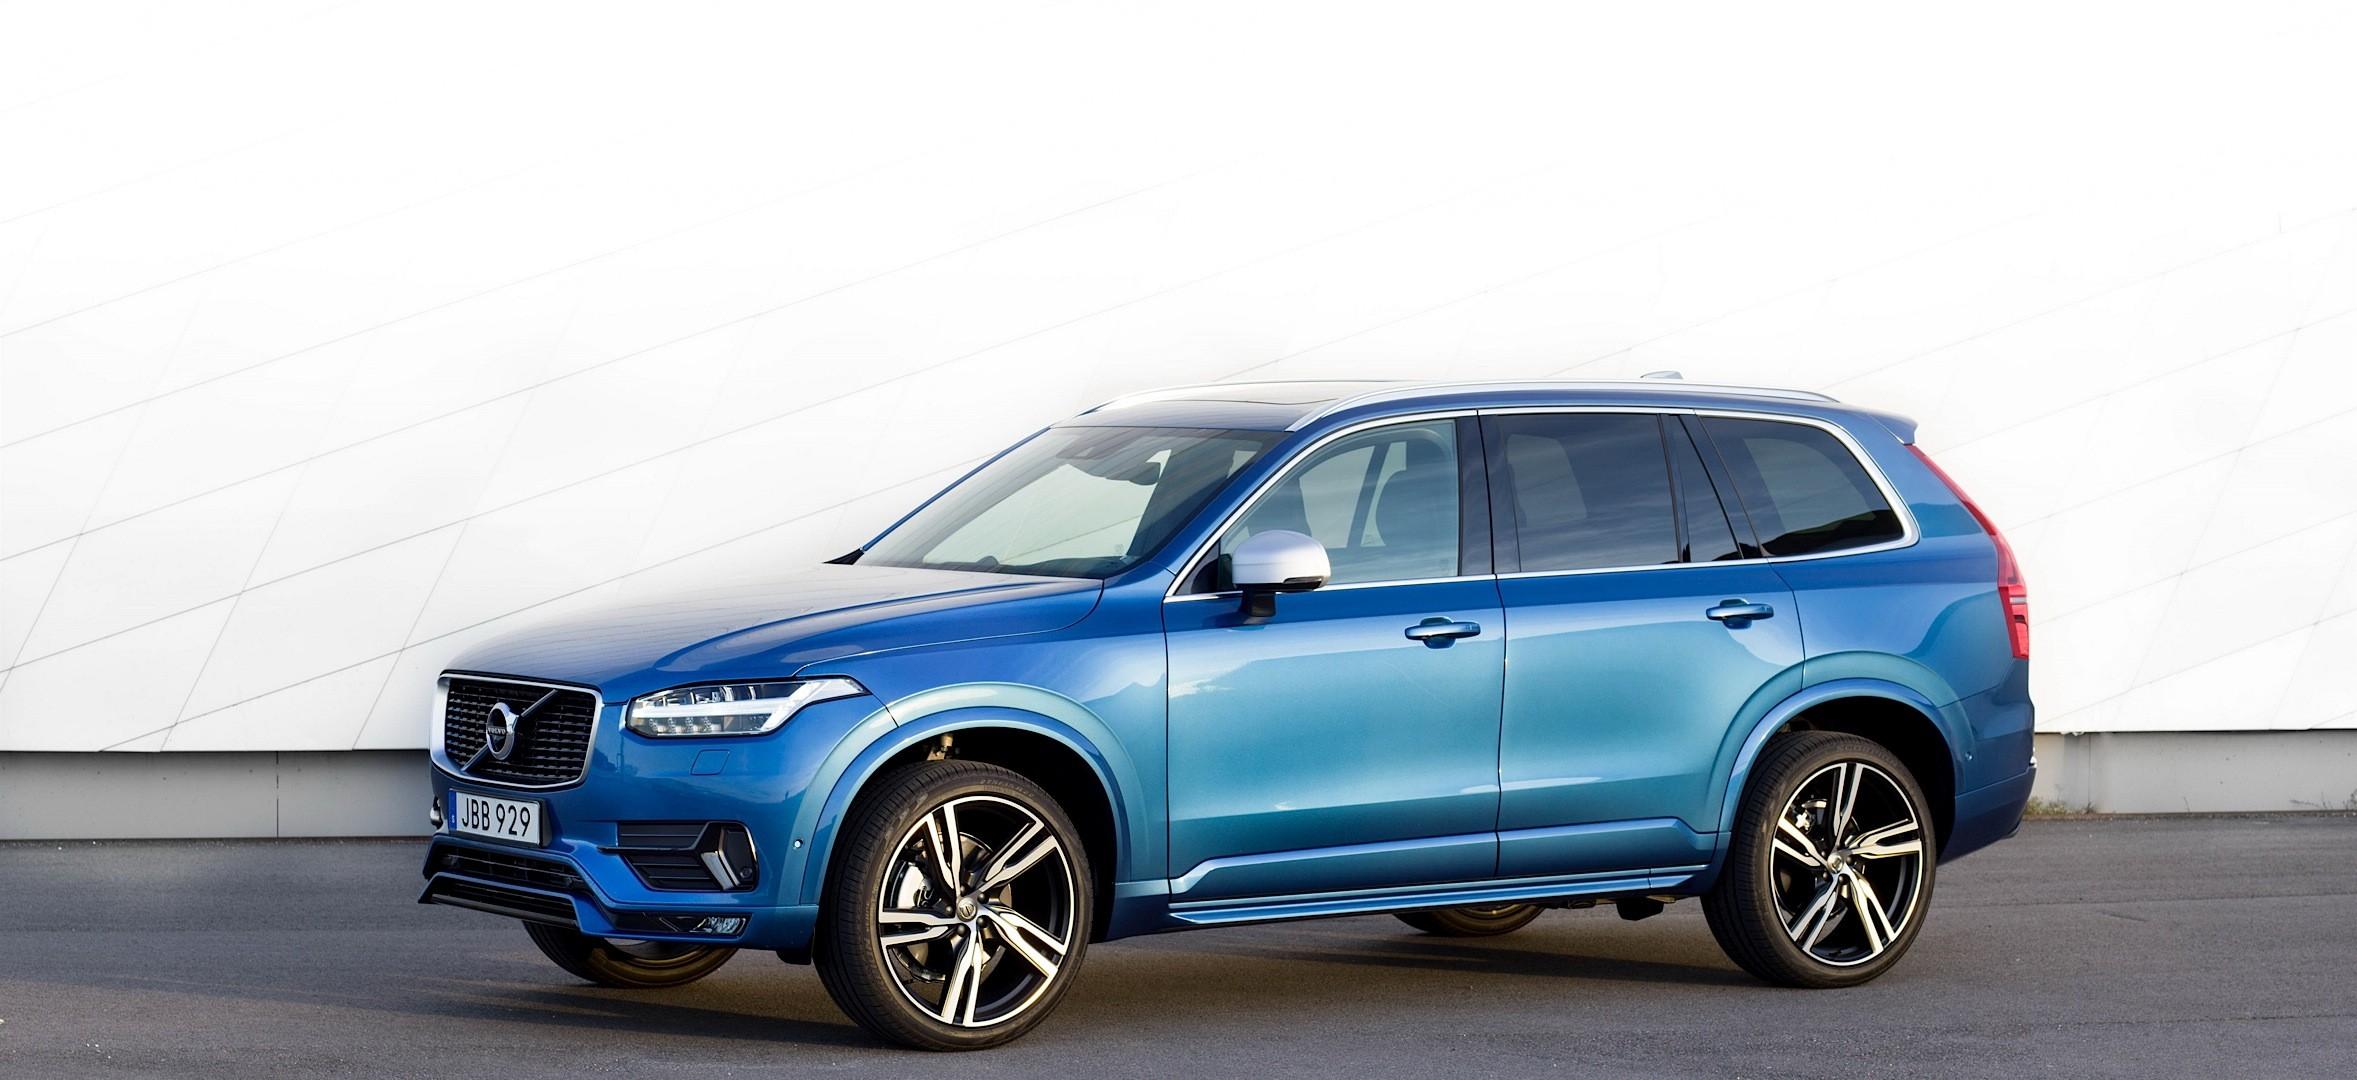 Volvo XC90 T6 R-Design Looks Good, Takes 100 KM/H Test With Polestar Kit - autoevolution